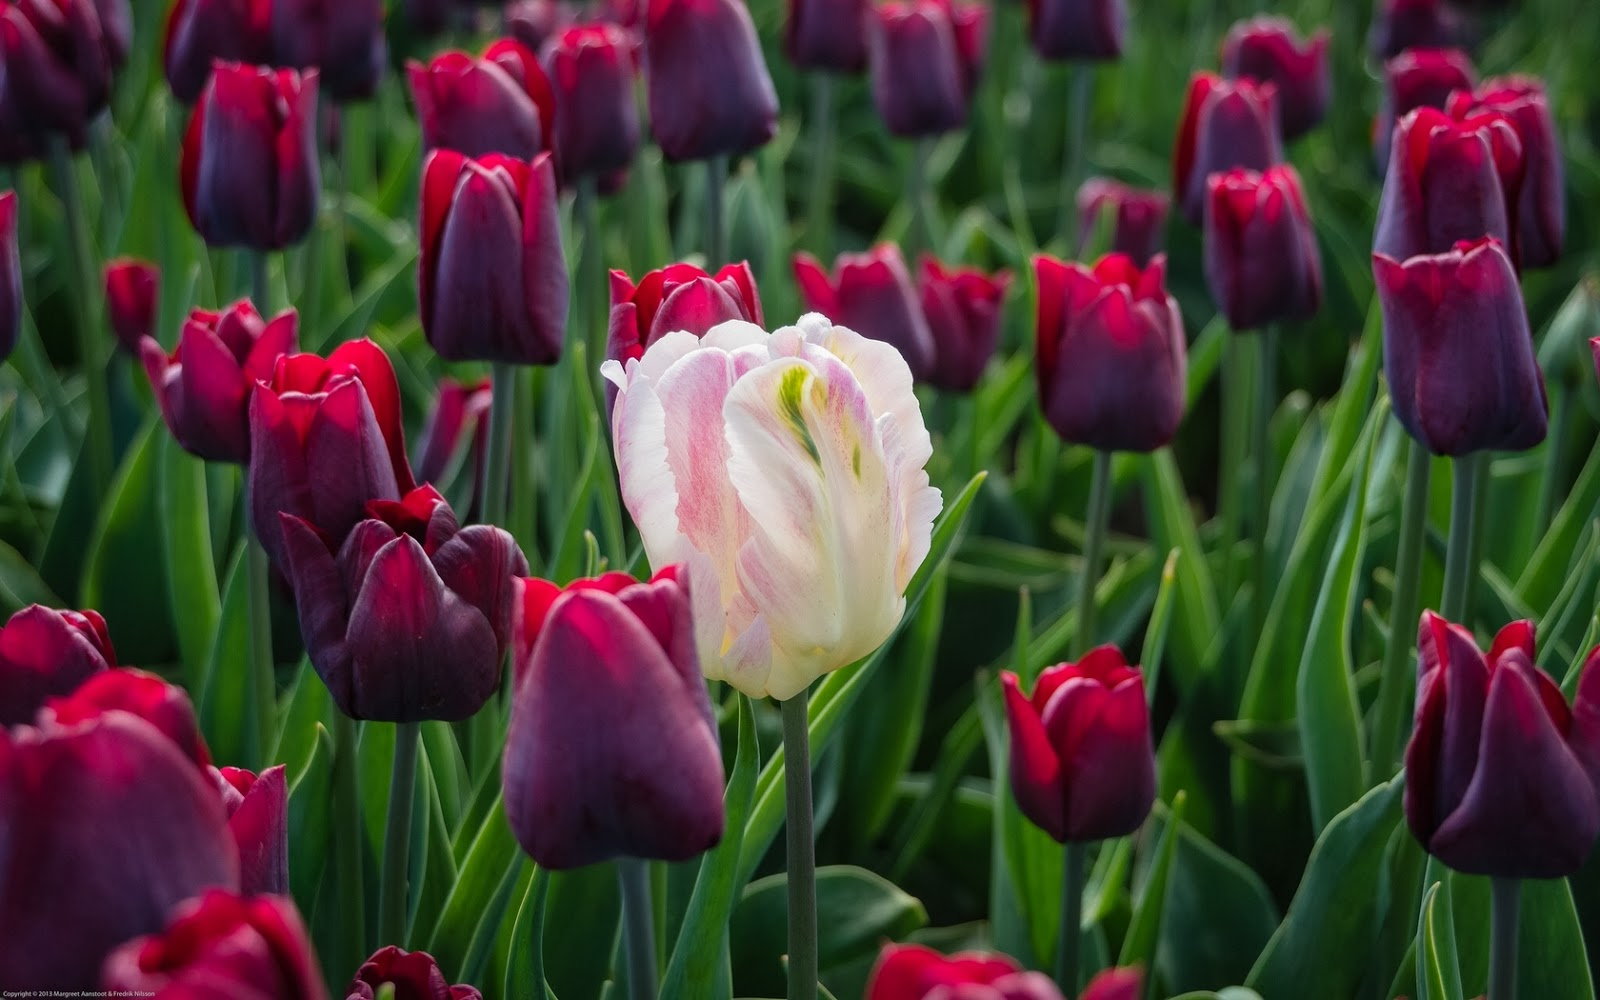 tulipanes, azalea, hortensias - Fotos Bonitas de Amor